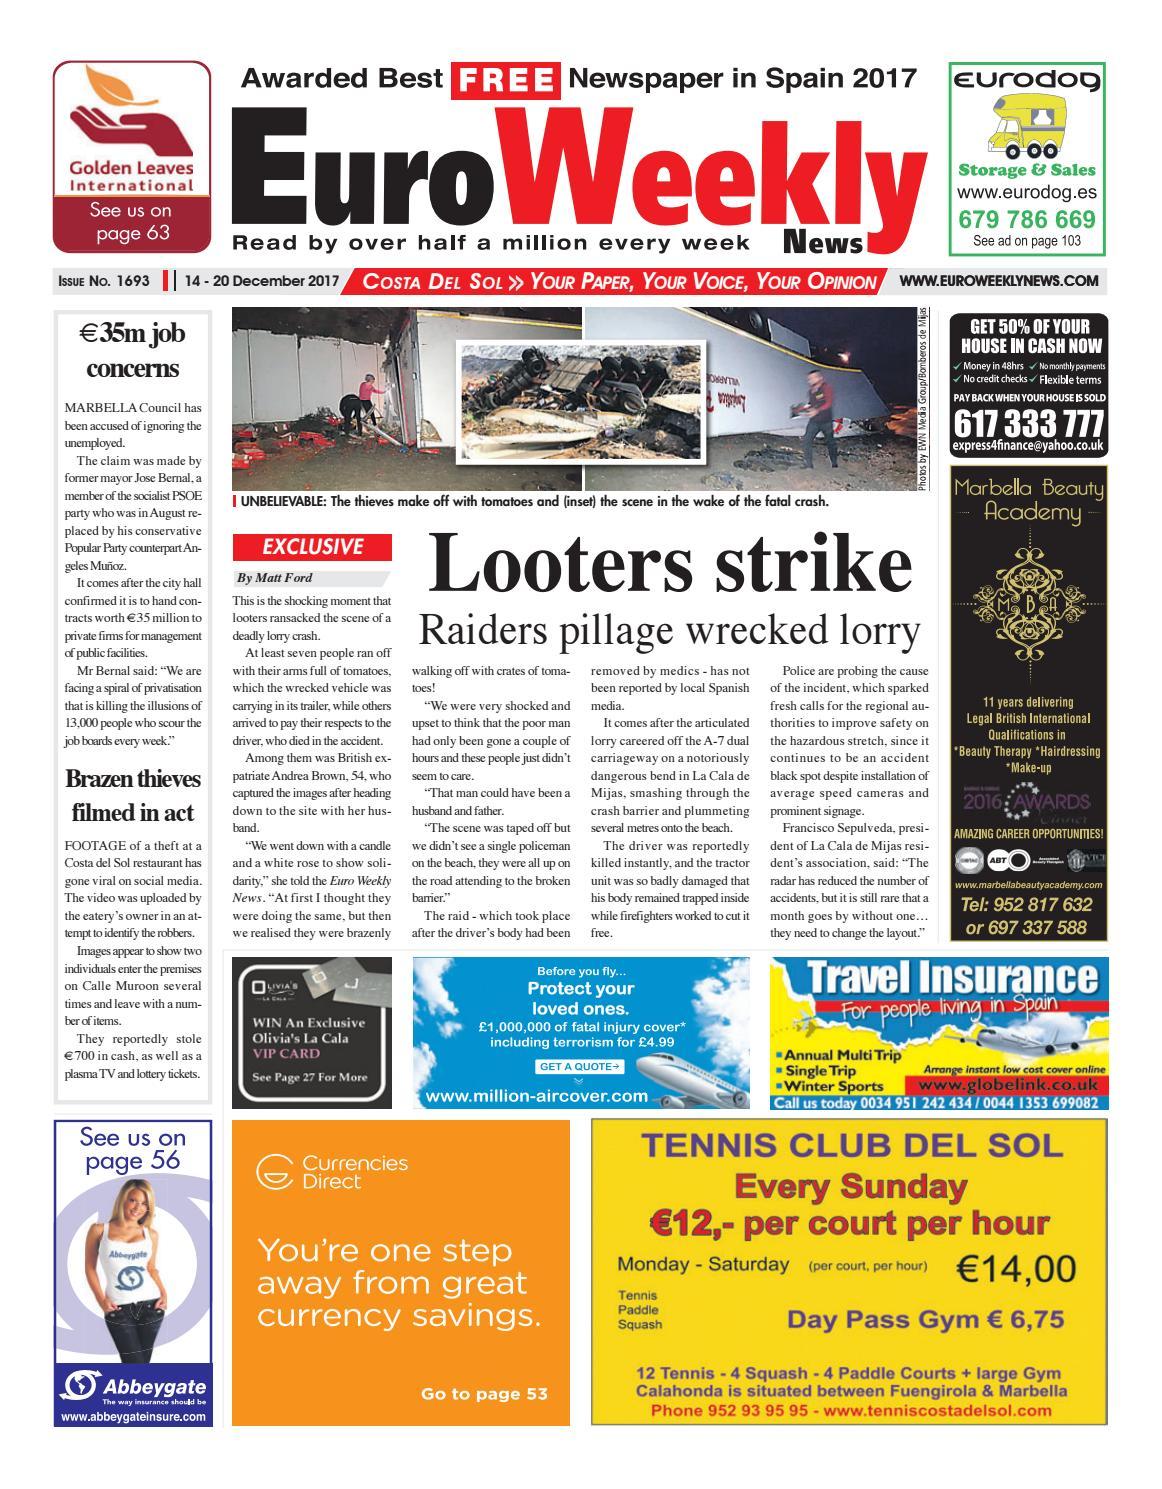 edd764cf533a3c Euro Weekly News - Costa del Sol 14 – 20 December 2017 Issue 1693 by Euro  Weekly News Media S.A. - issuu